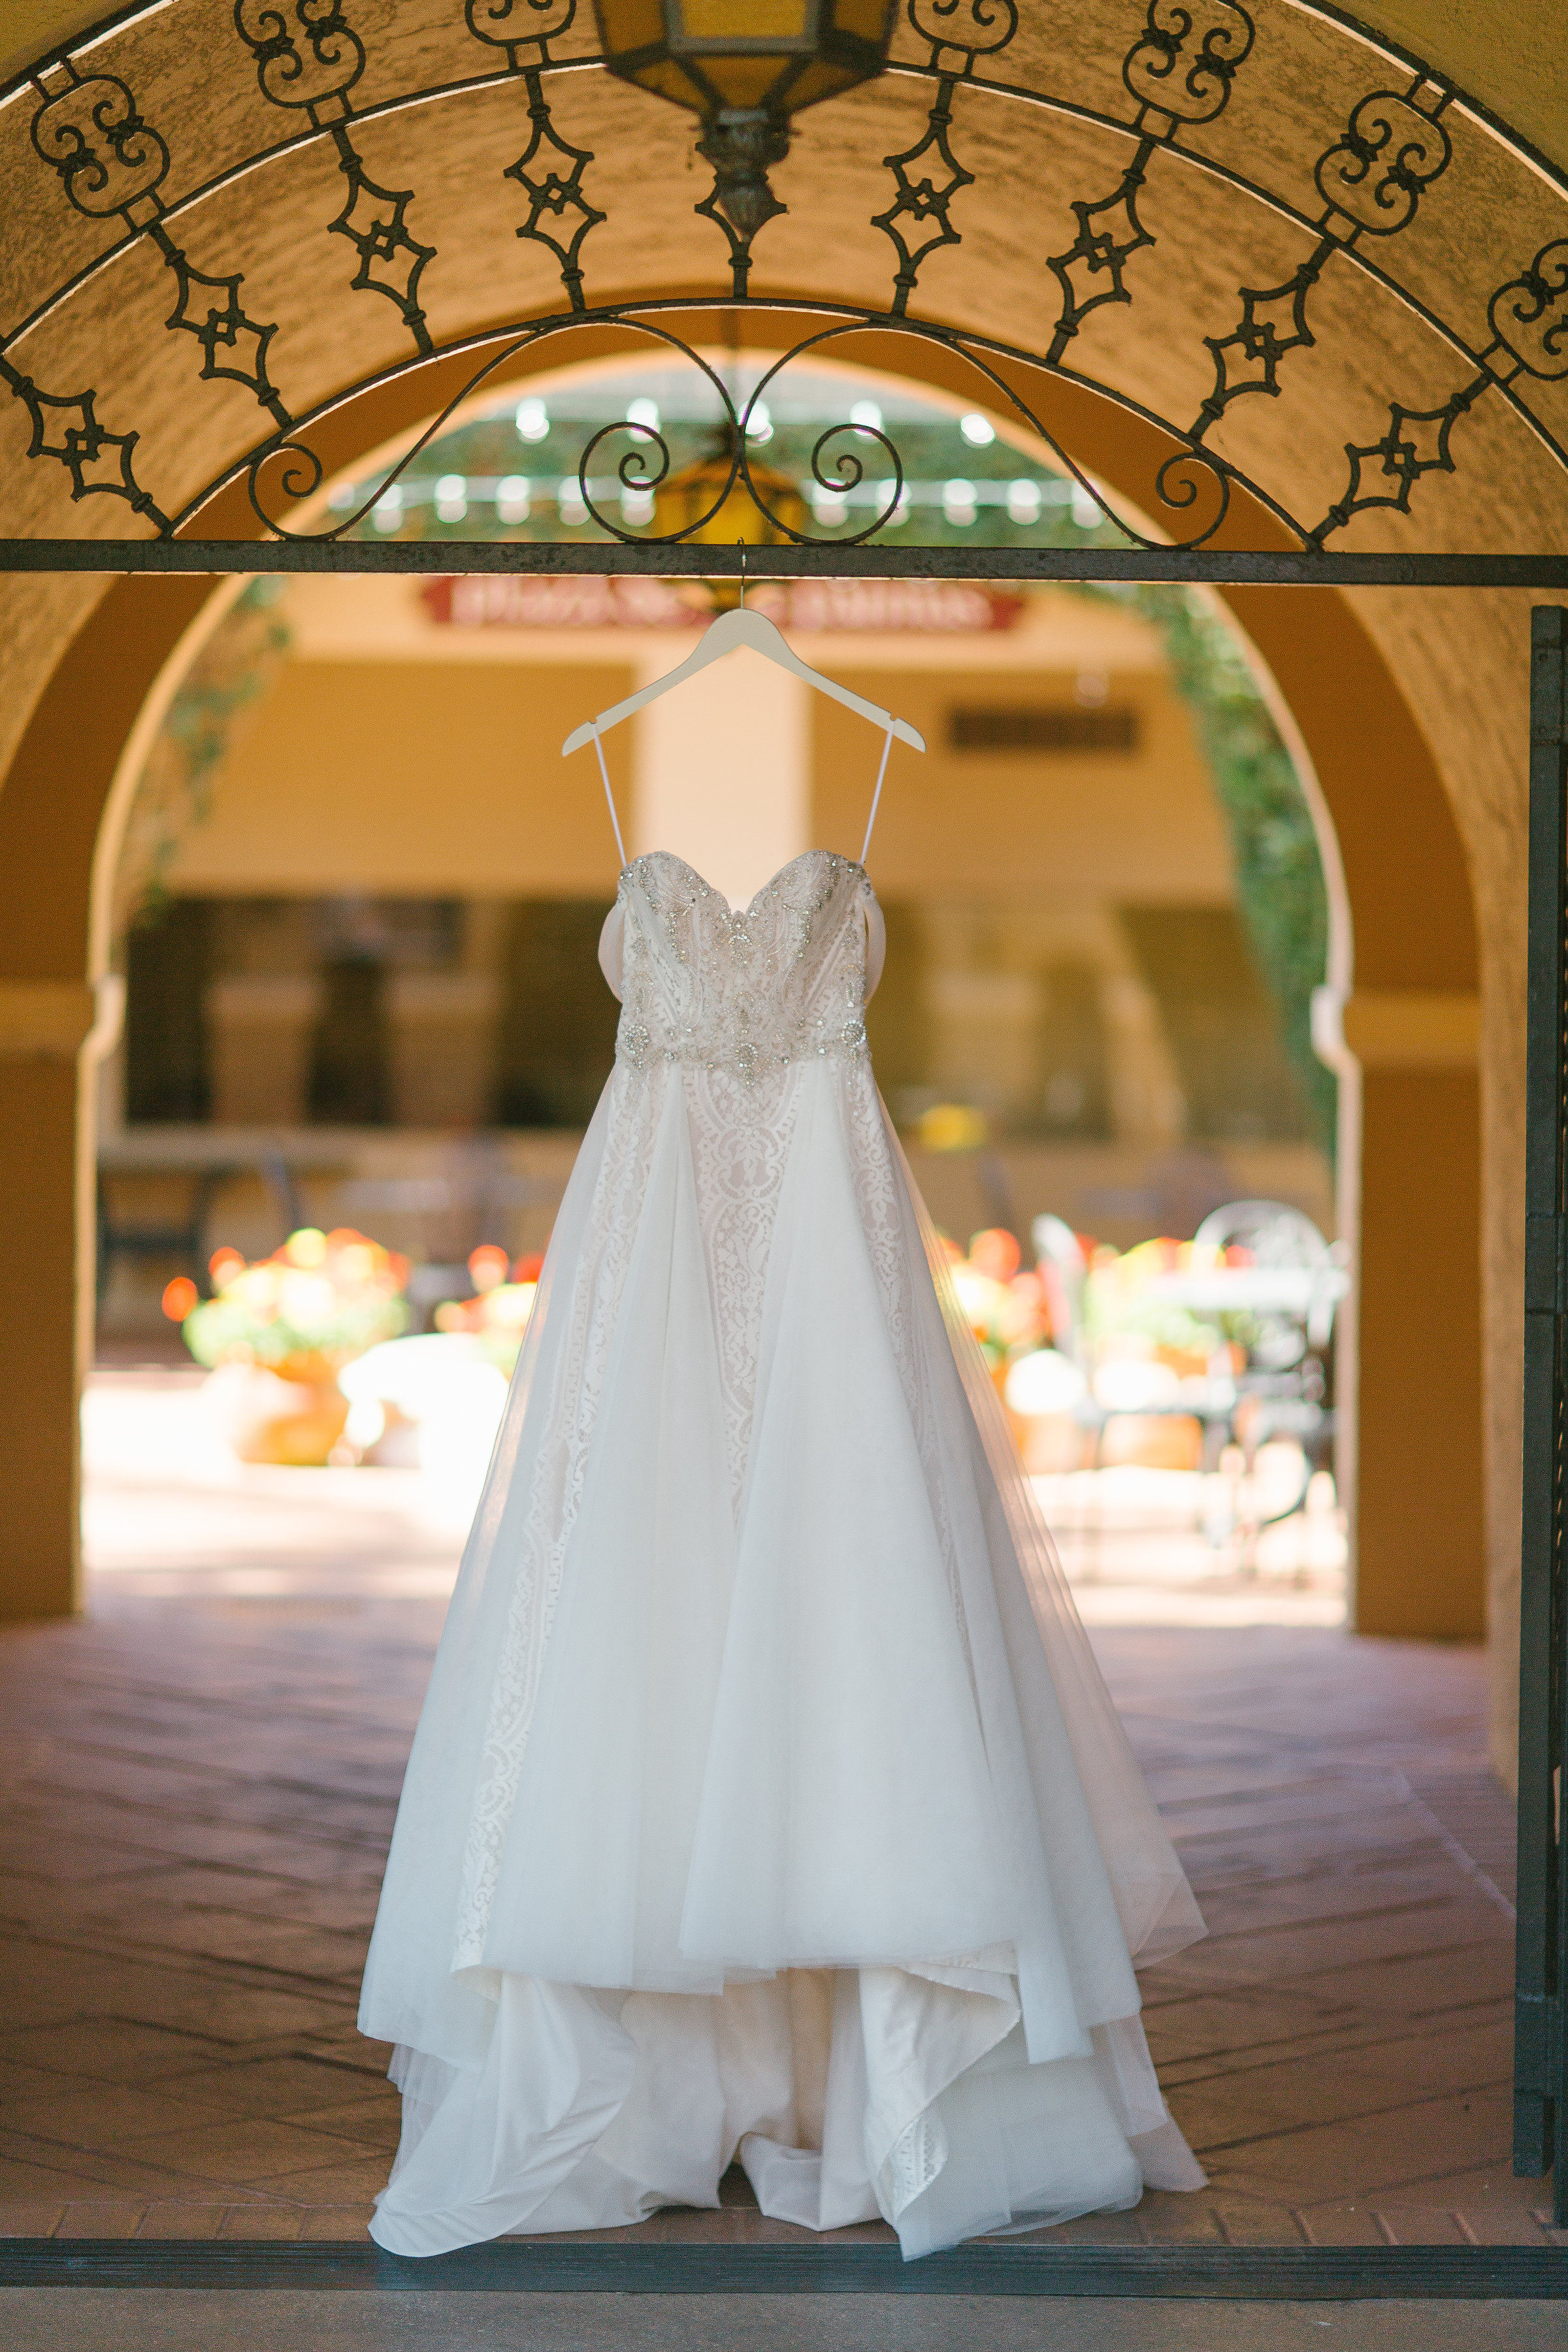 Wedding dress hanging from iron gate